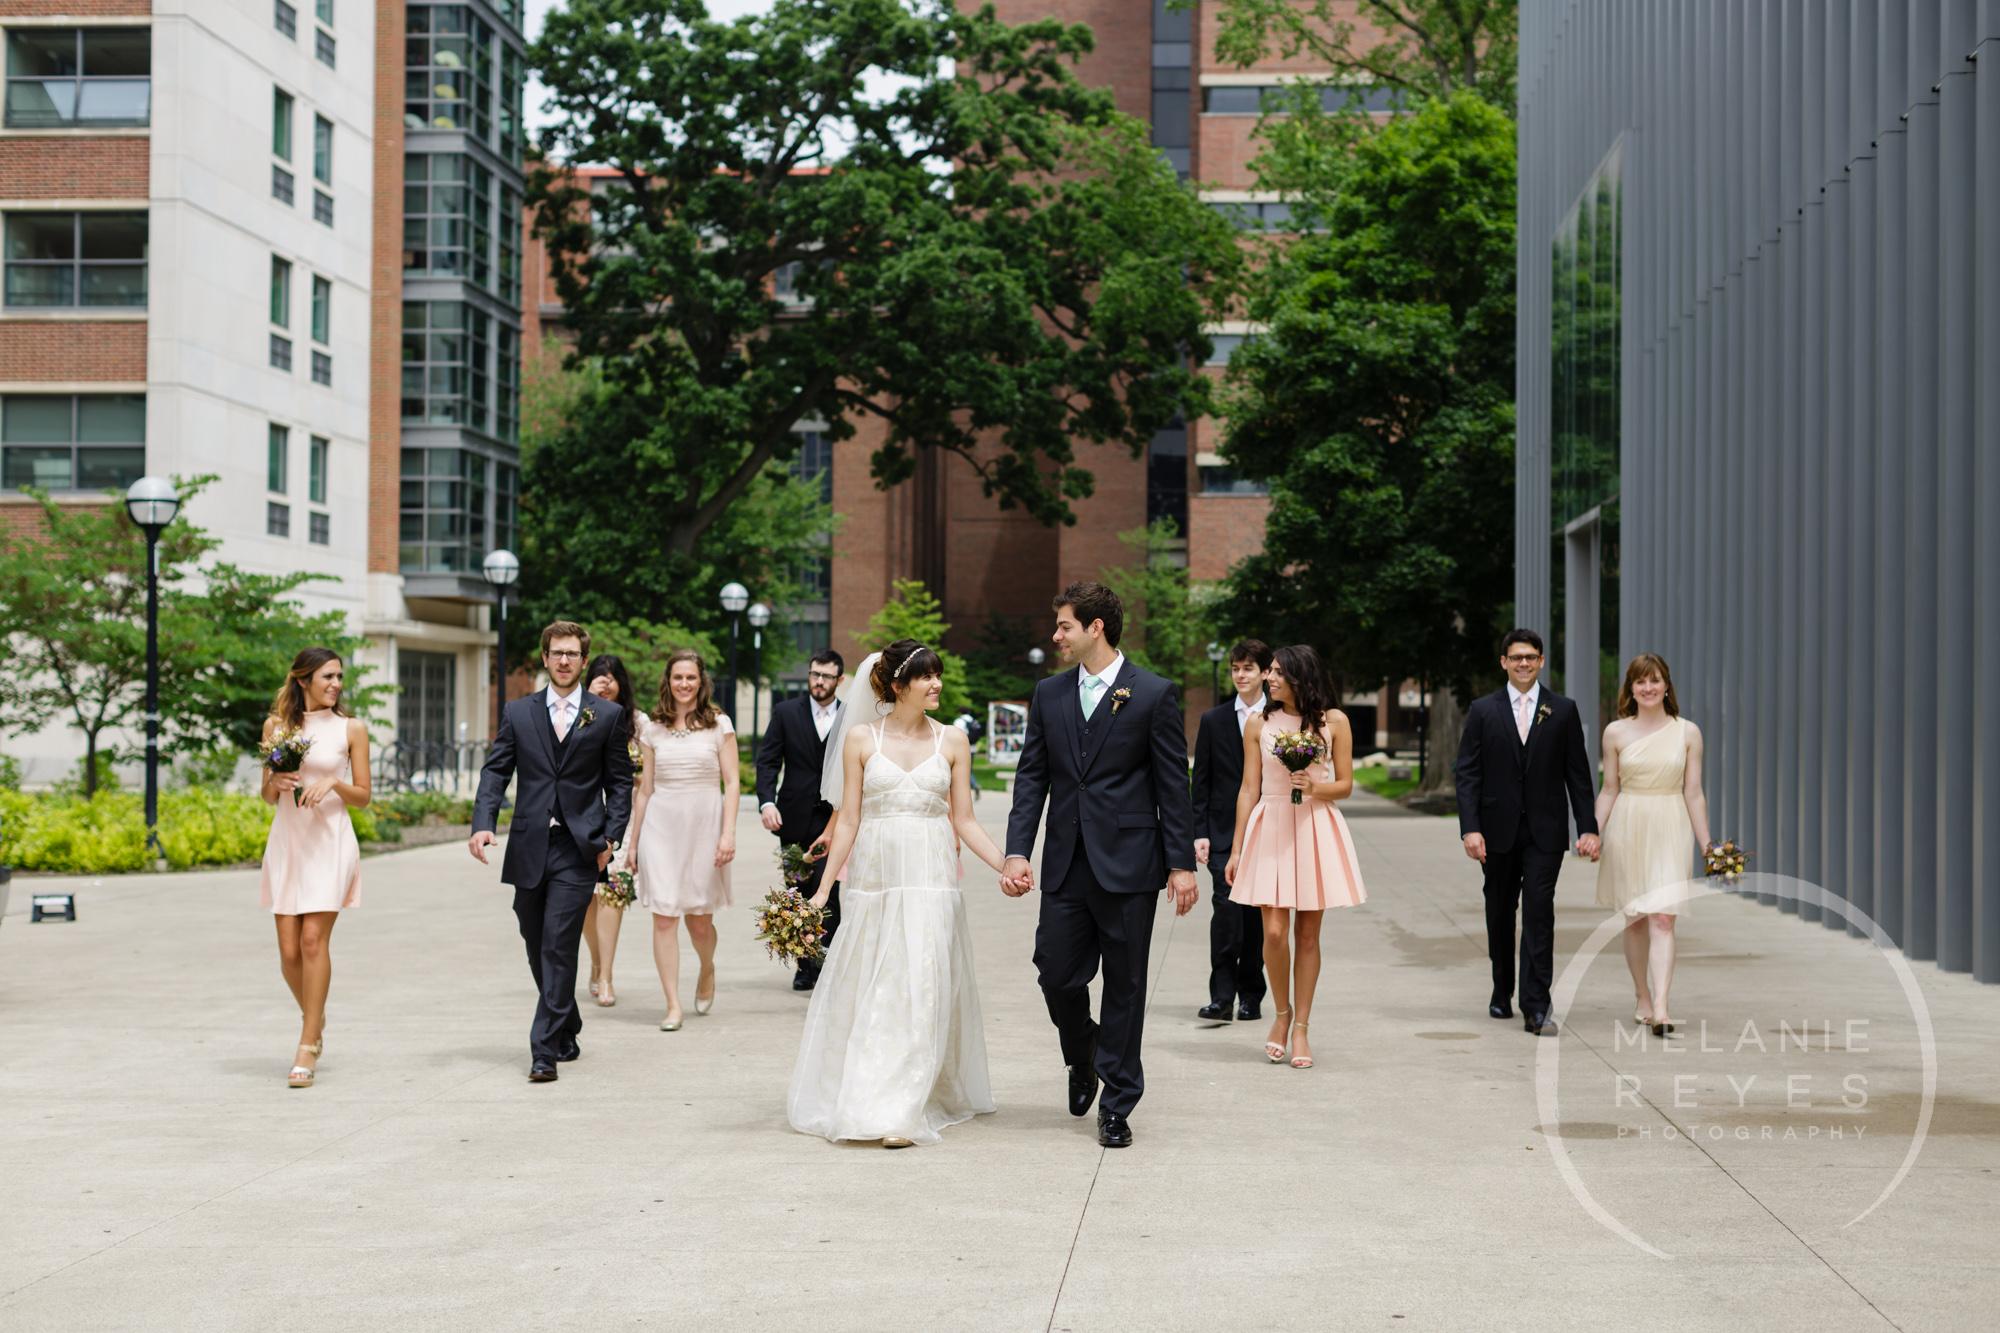 carlylewie_annarbor_wedding_-34.jpg